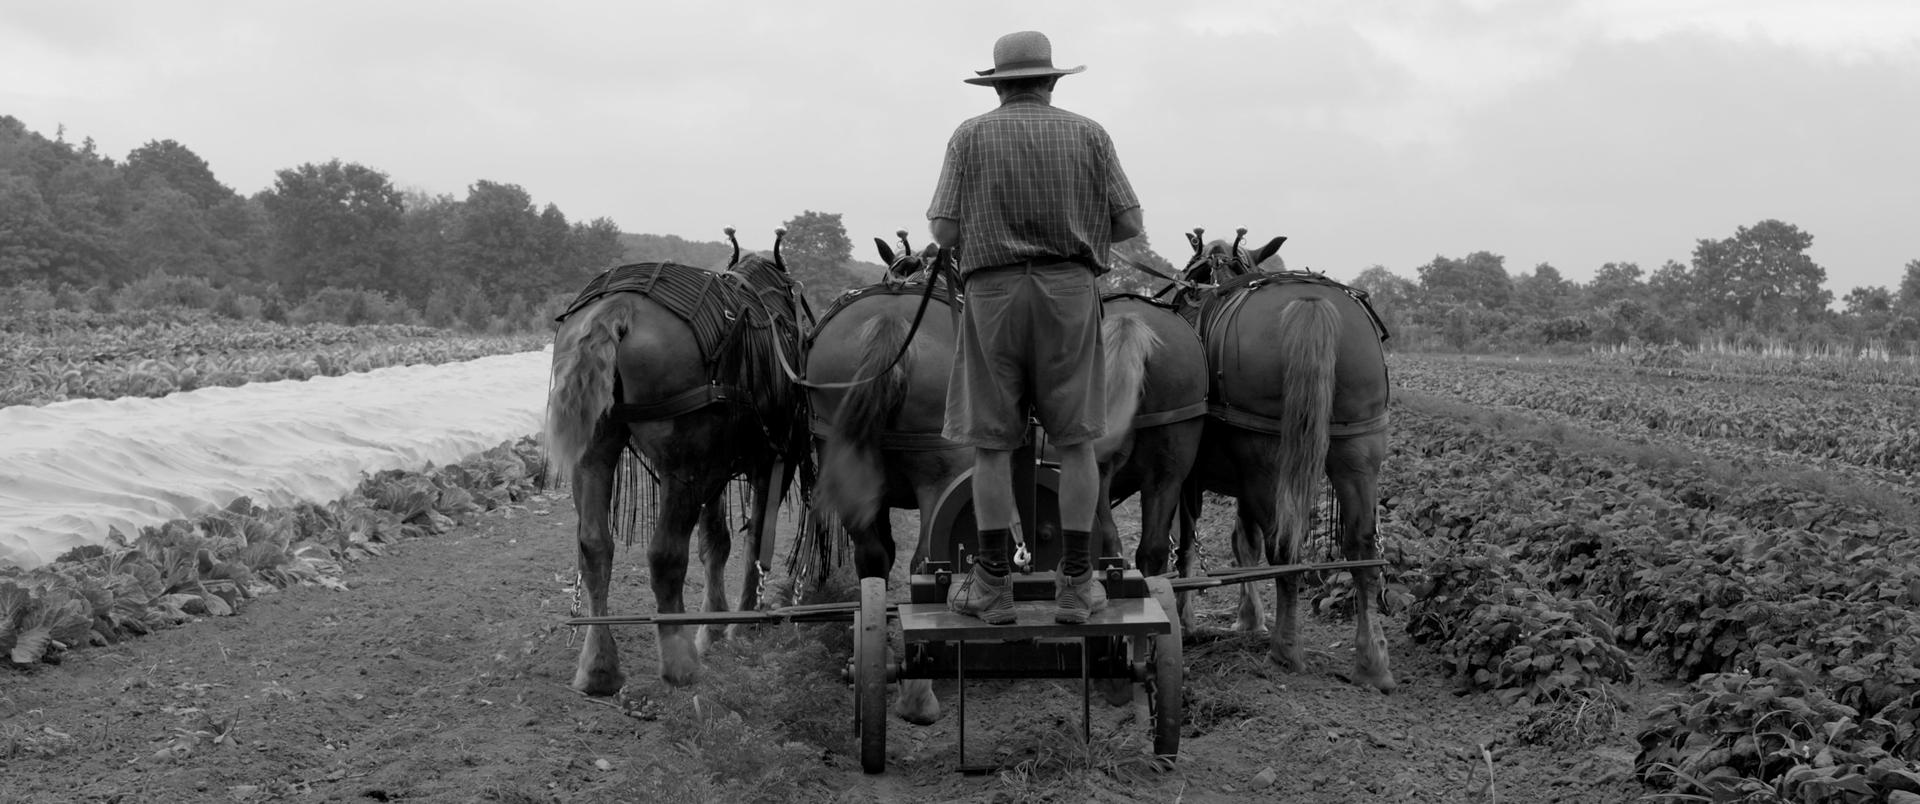 Workhorse-Still03-Farming-Fix.jpg